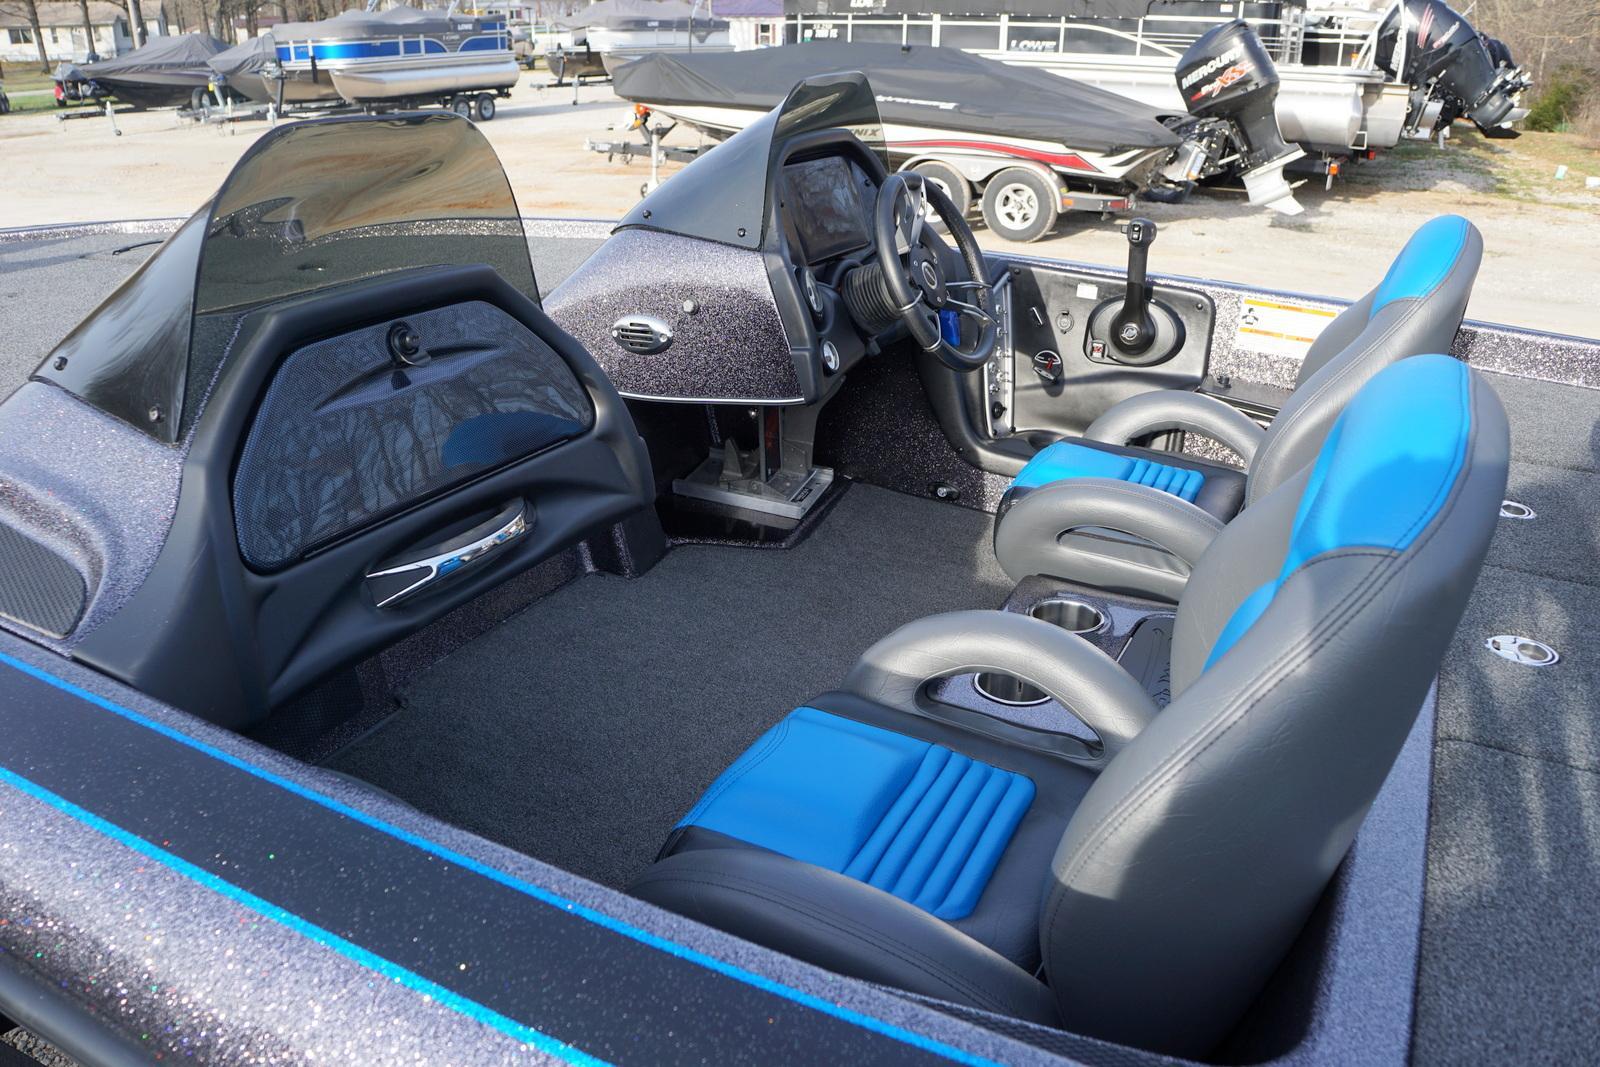 BLAZER 595 PRO-ELITE W/ 200HP MERCURY PRO-XS